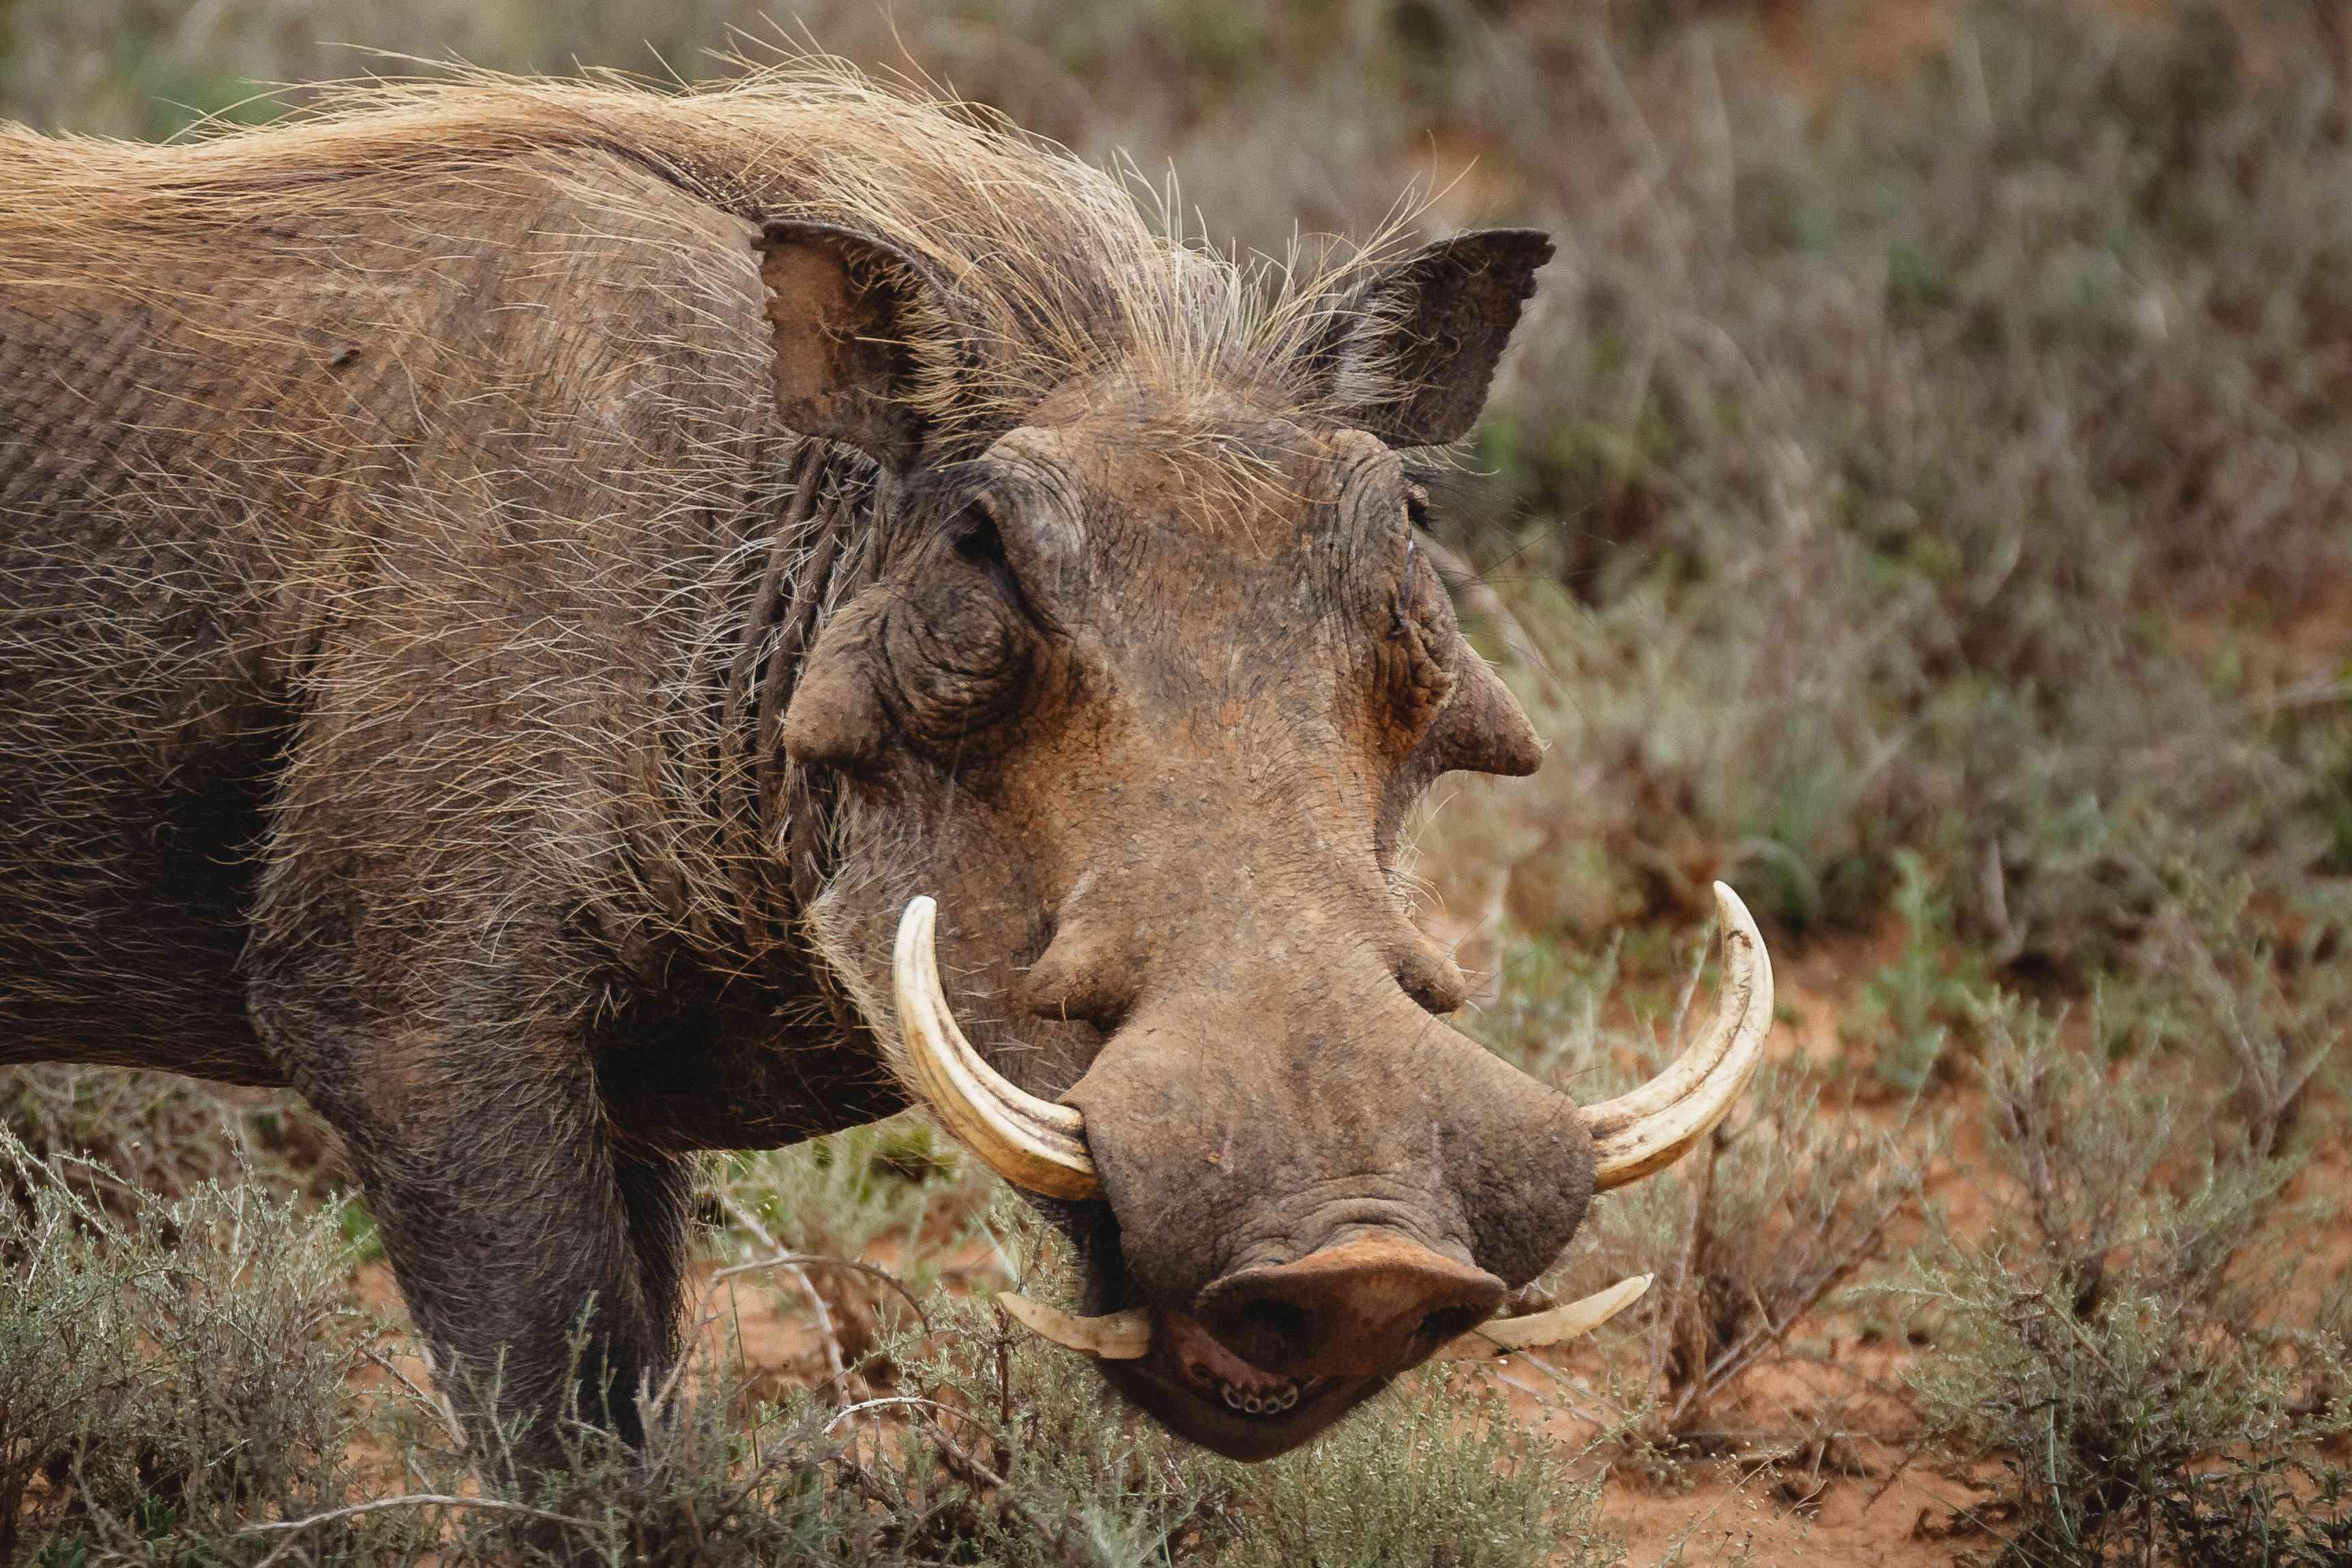 Close up view of warthog tusks